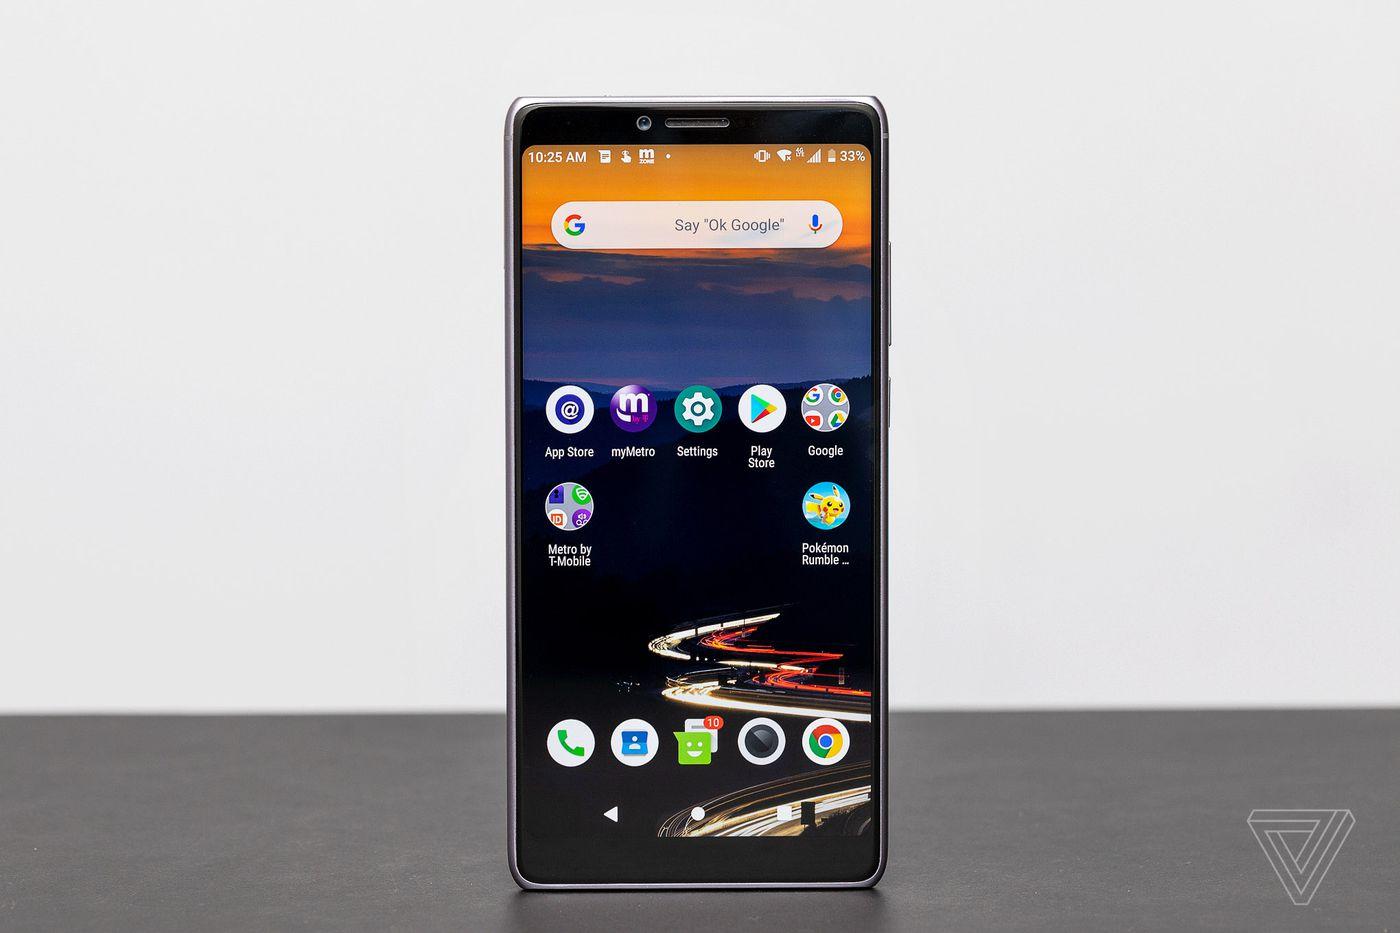 Budget phone review: Nokia 4 2 vs  Coolpad Legacy vs  Rokit IO 3D